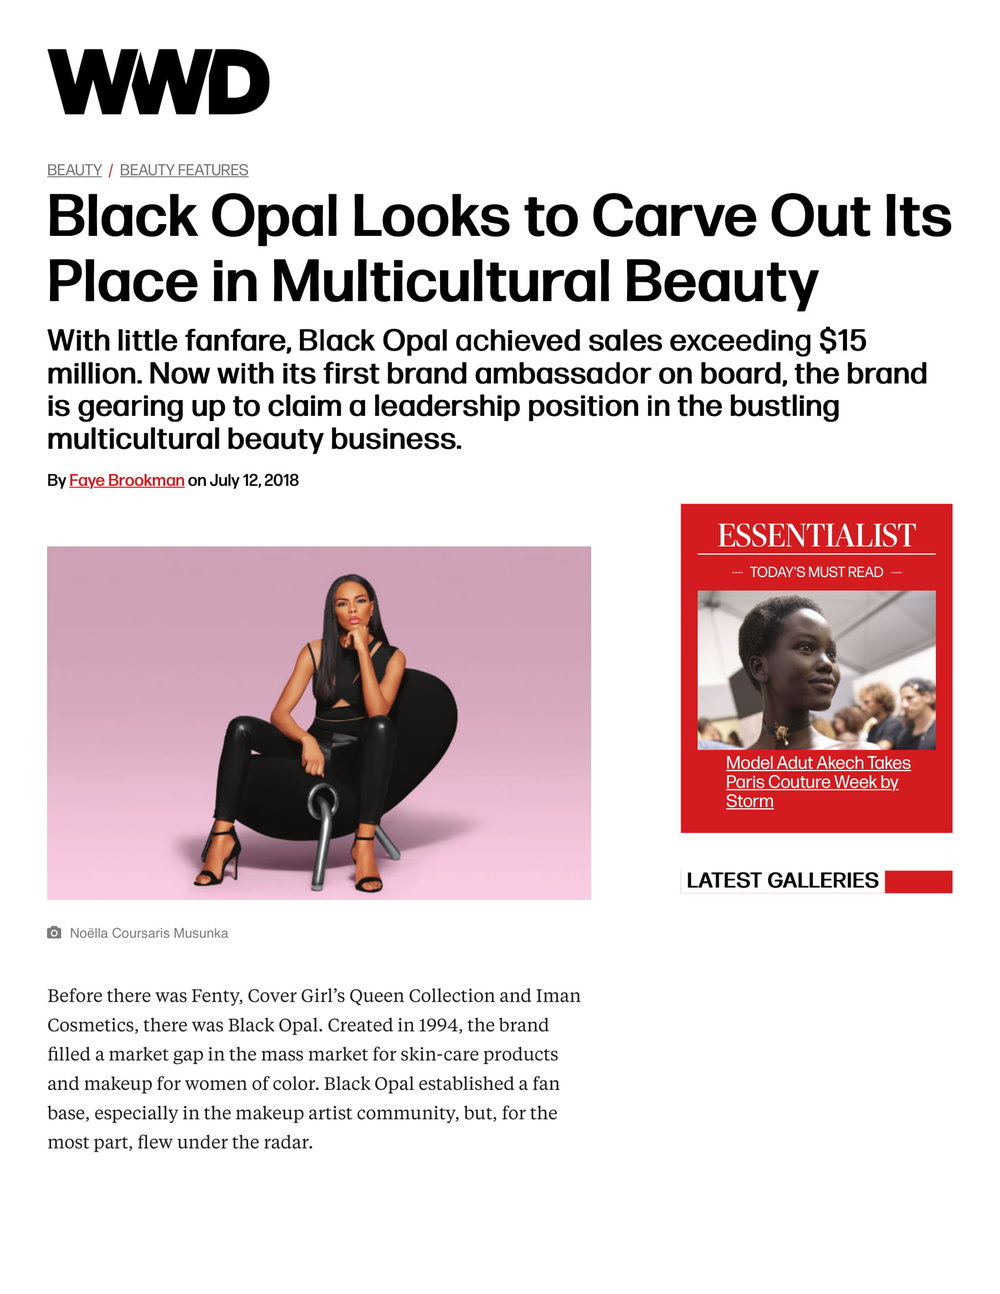 Black Opal Names Noella Brand Ambassador-1.jpg